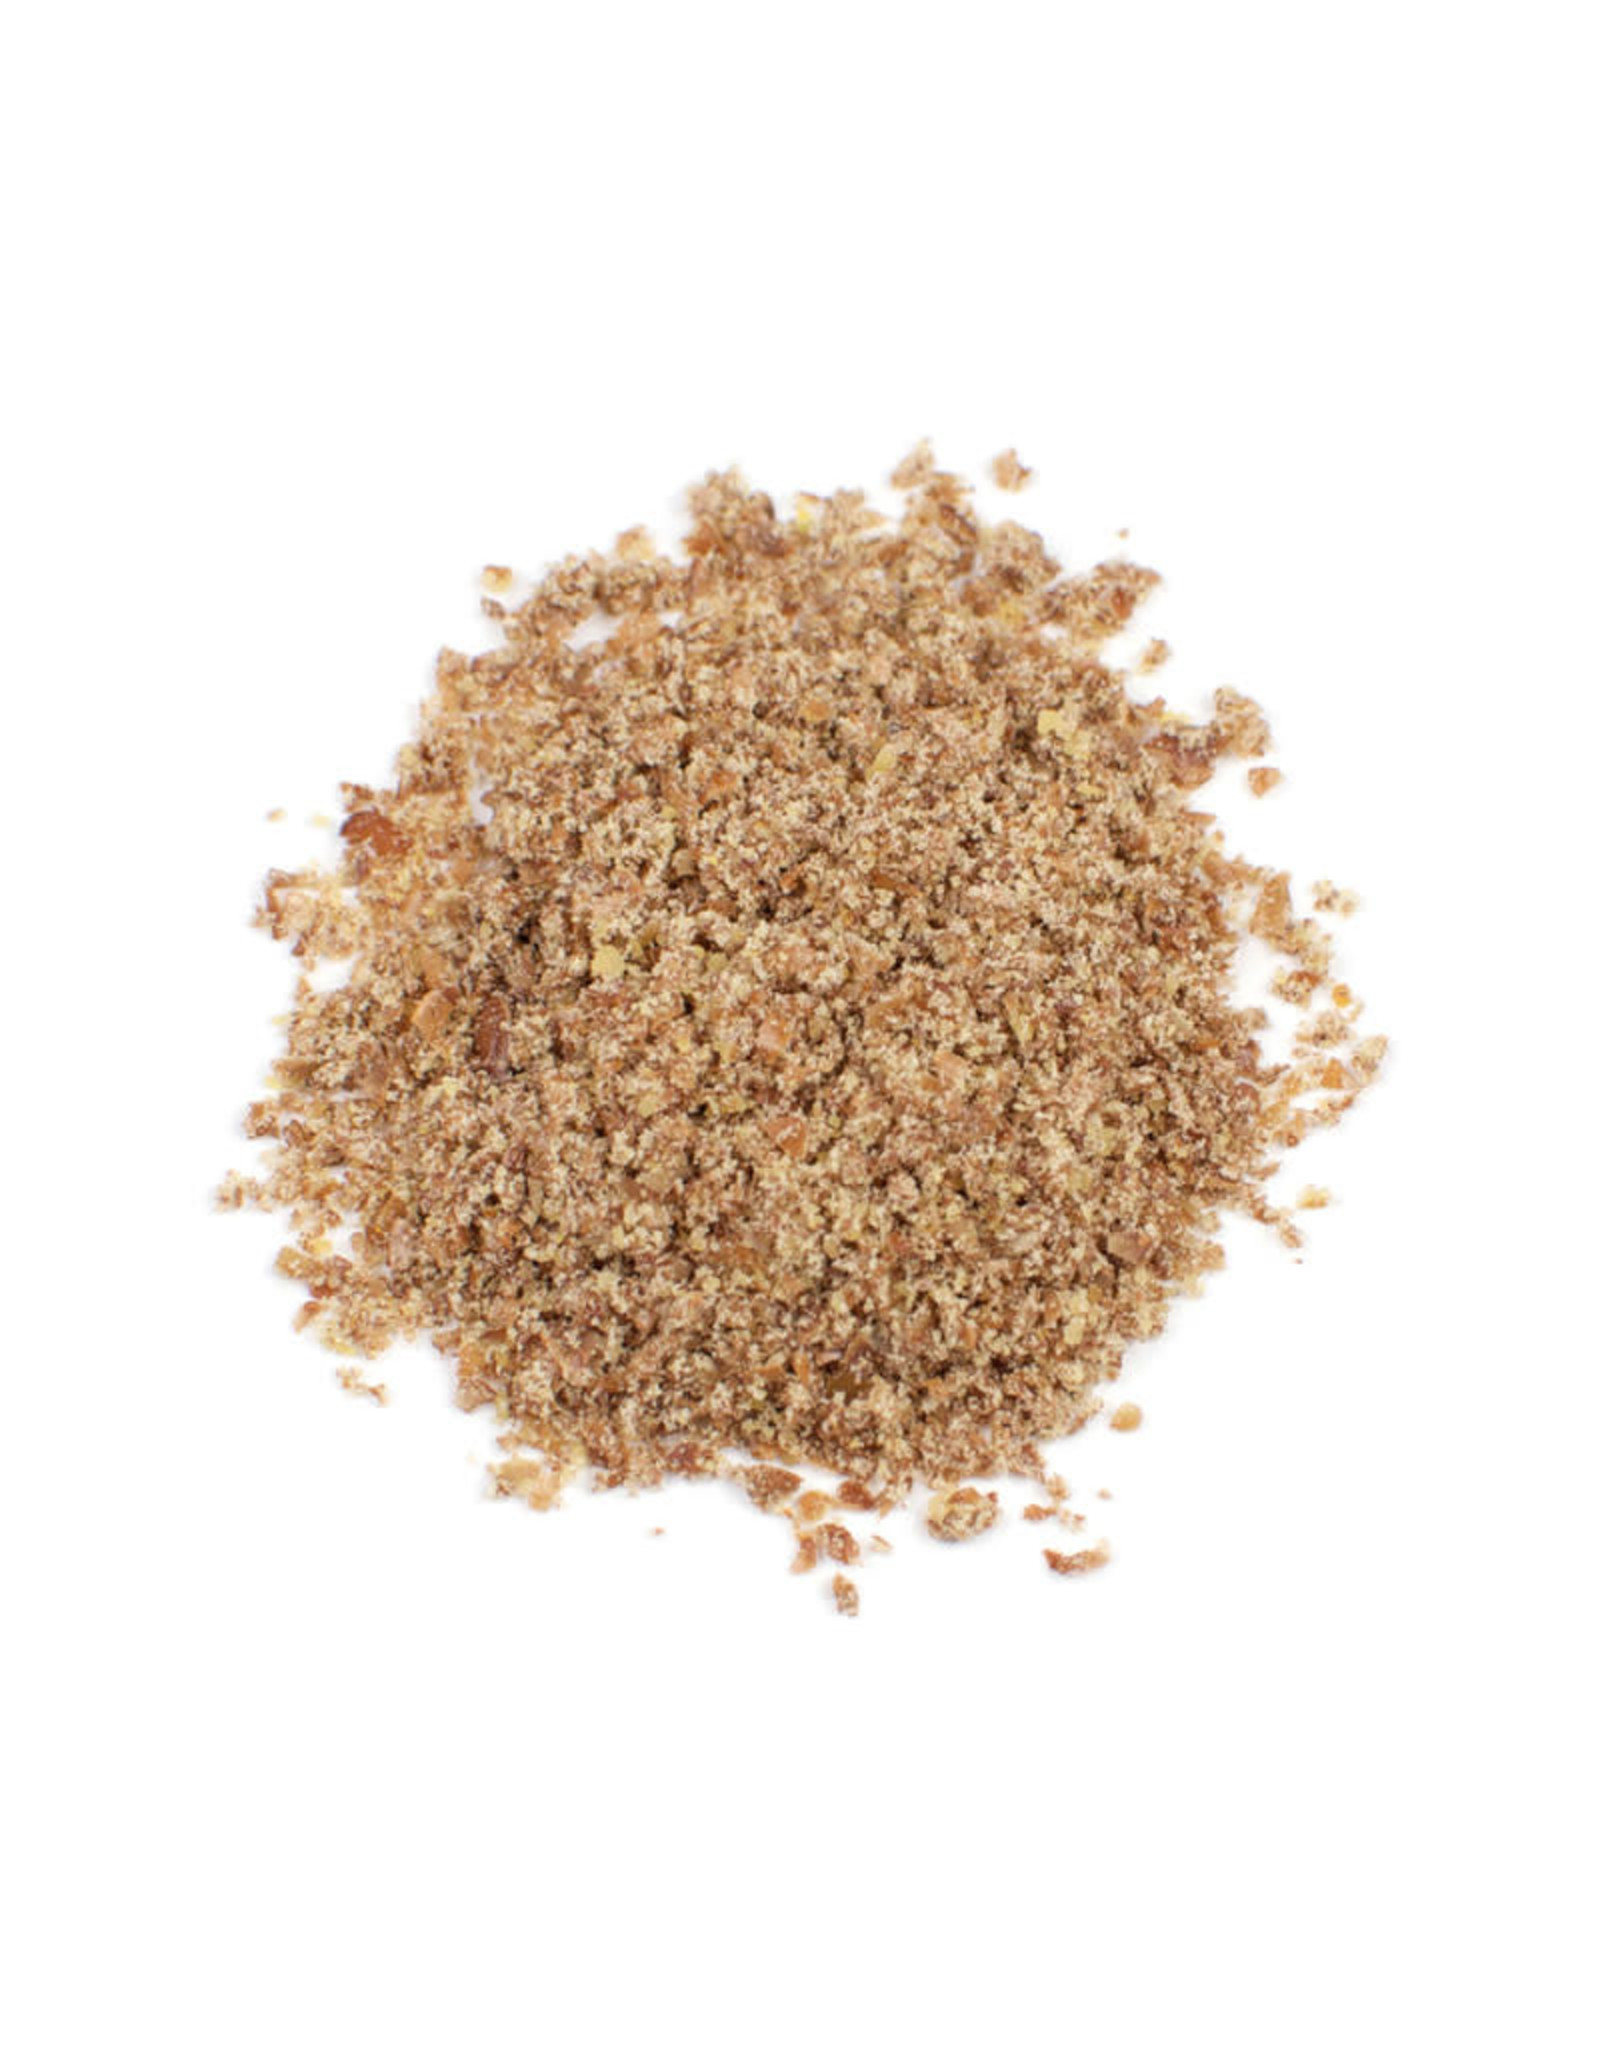 Seminole Feed 60568 INGRED- Flax Seed, Ground, 50#